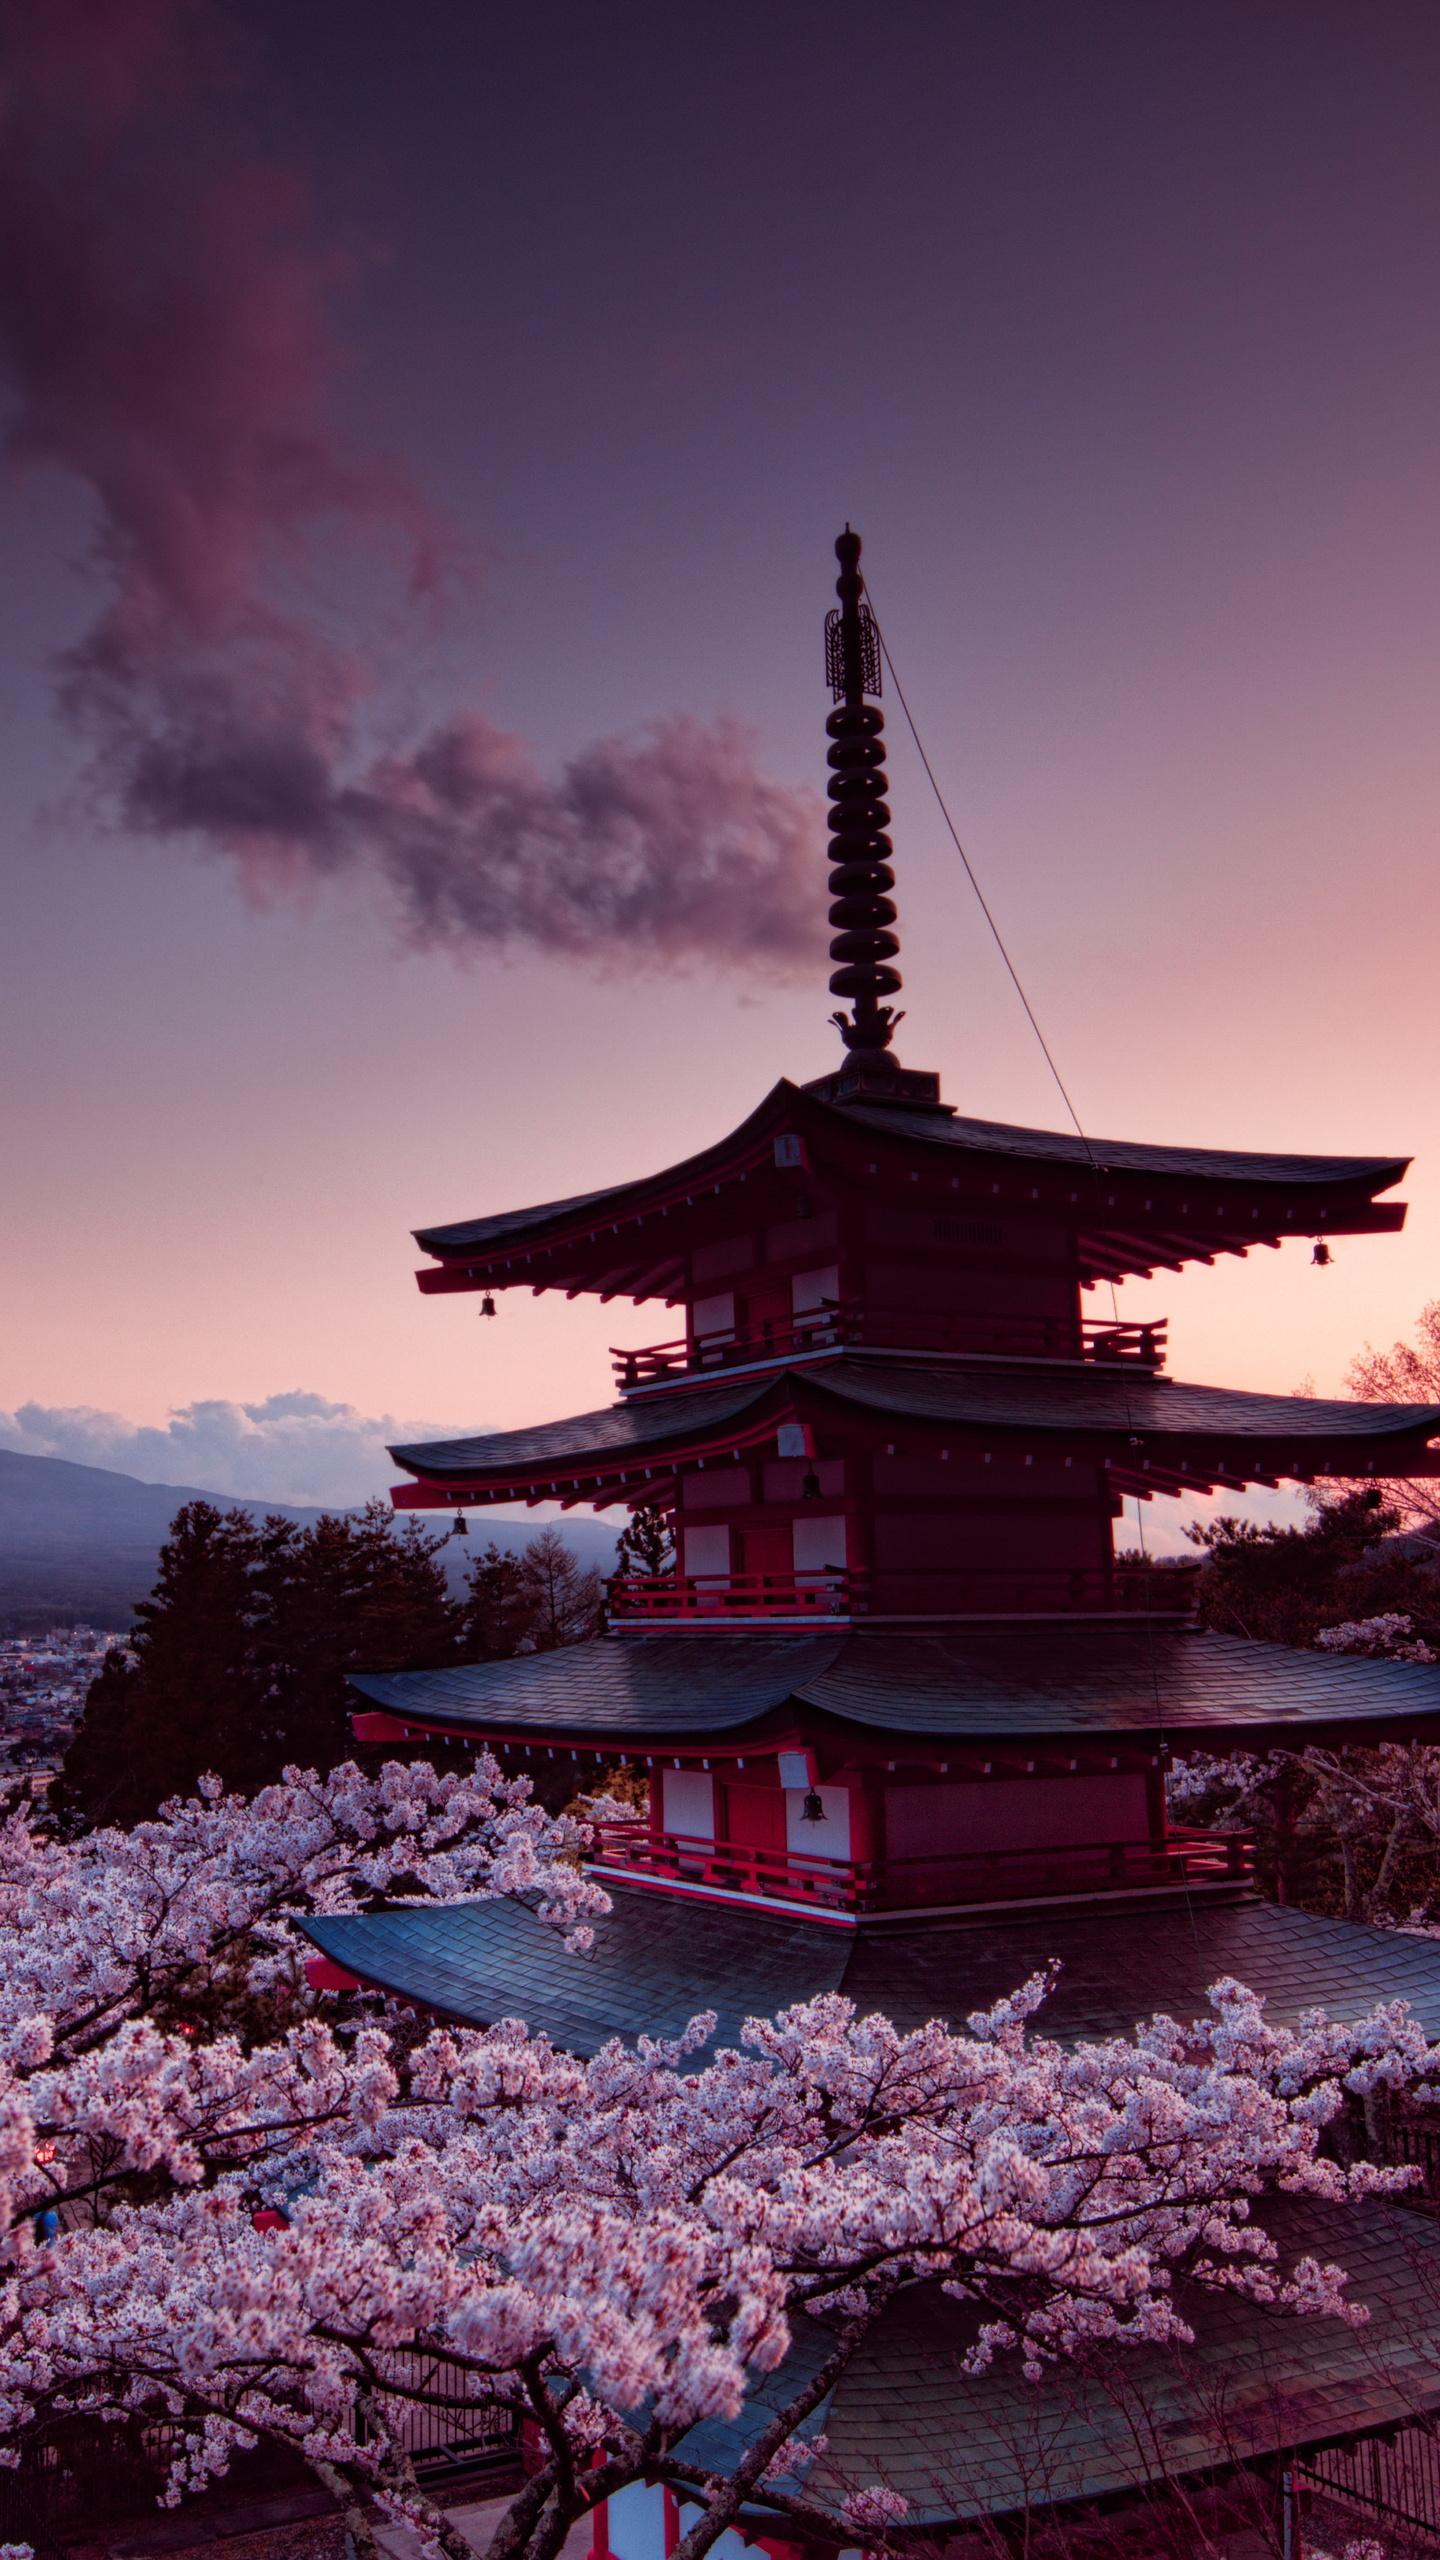 churei-tower-mount-fuji-in-japan-8k-68.jpg